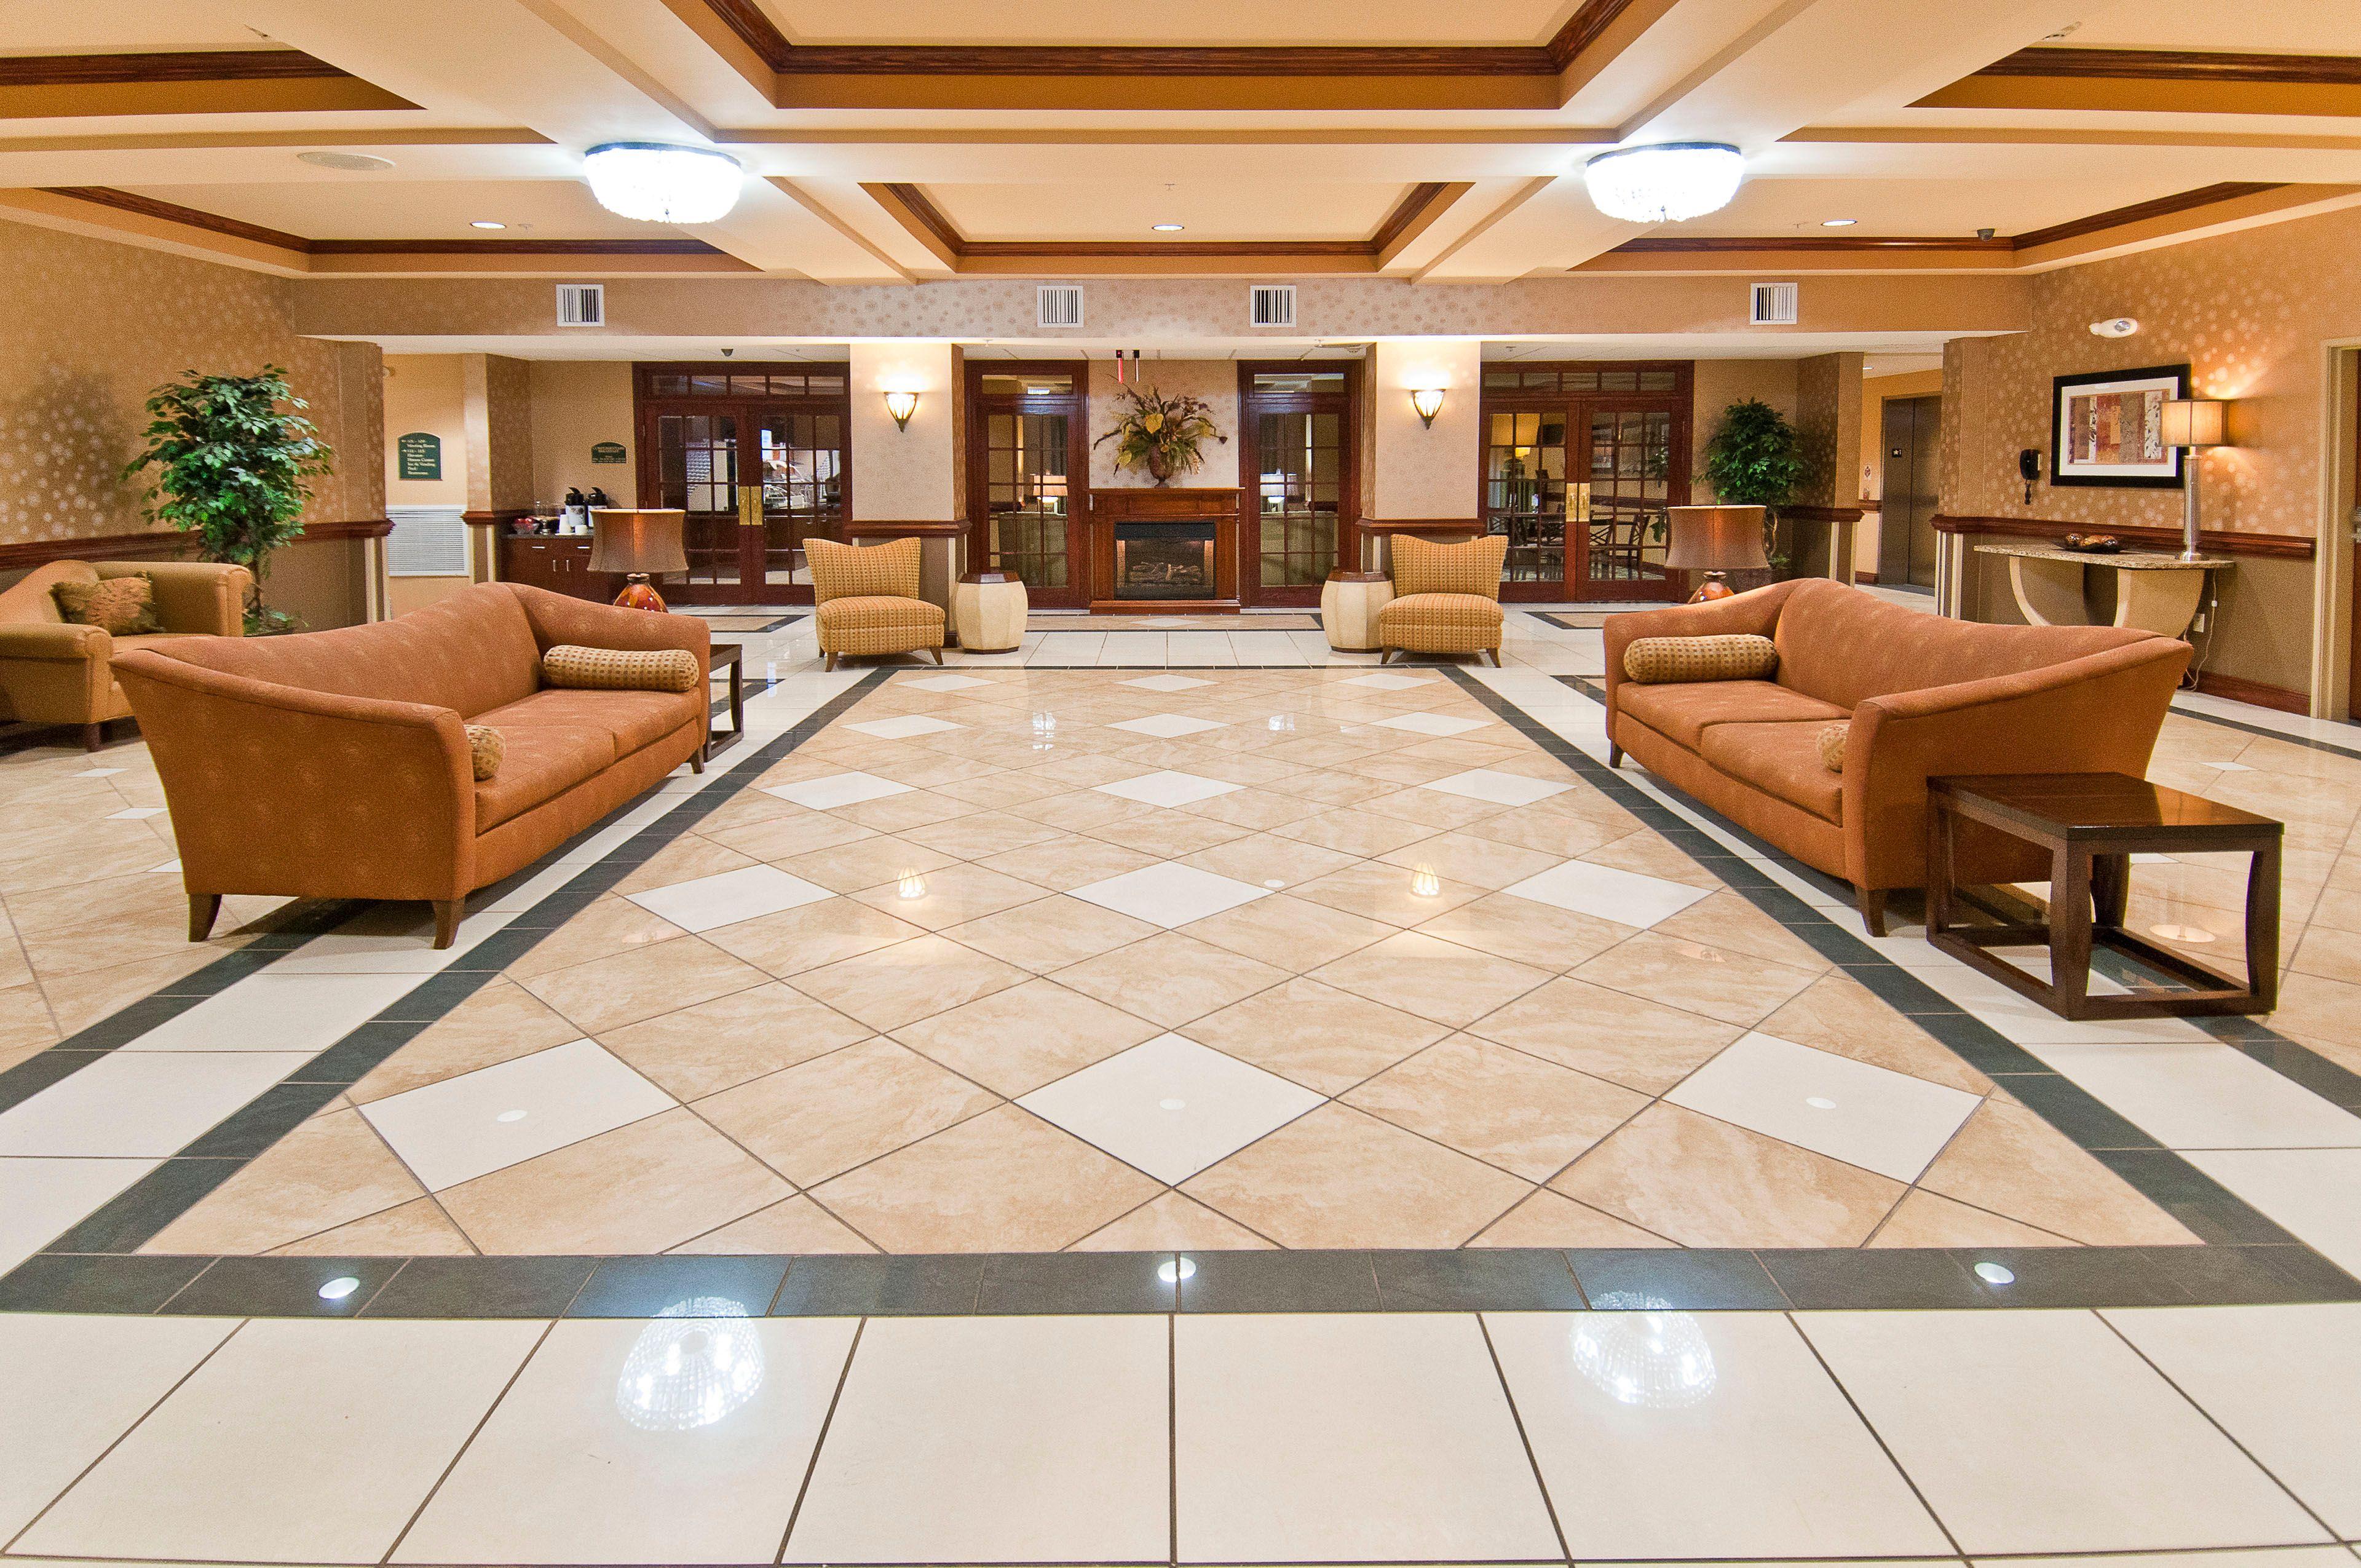 Holiday Inn Express & Suites Biloxi- Ocean Springs image 6